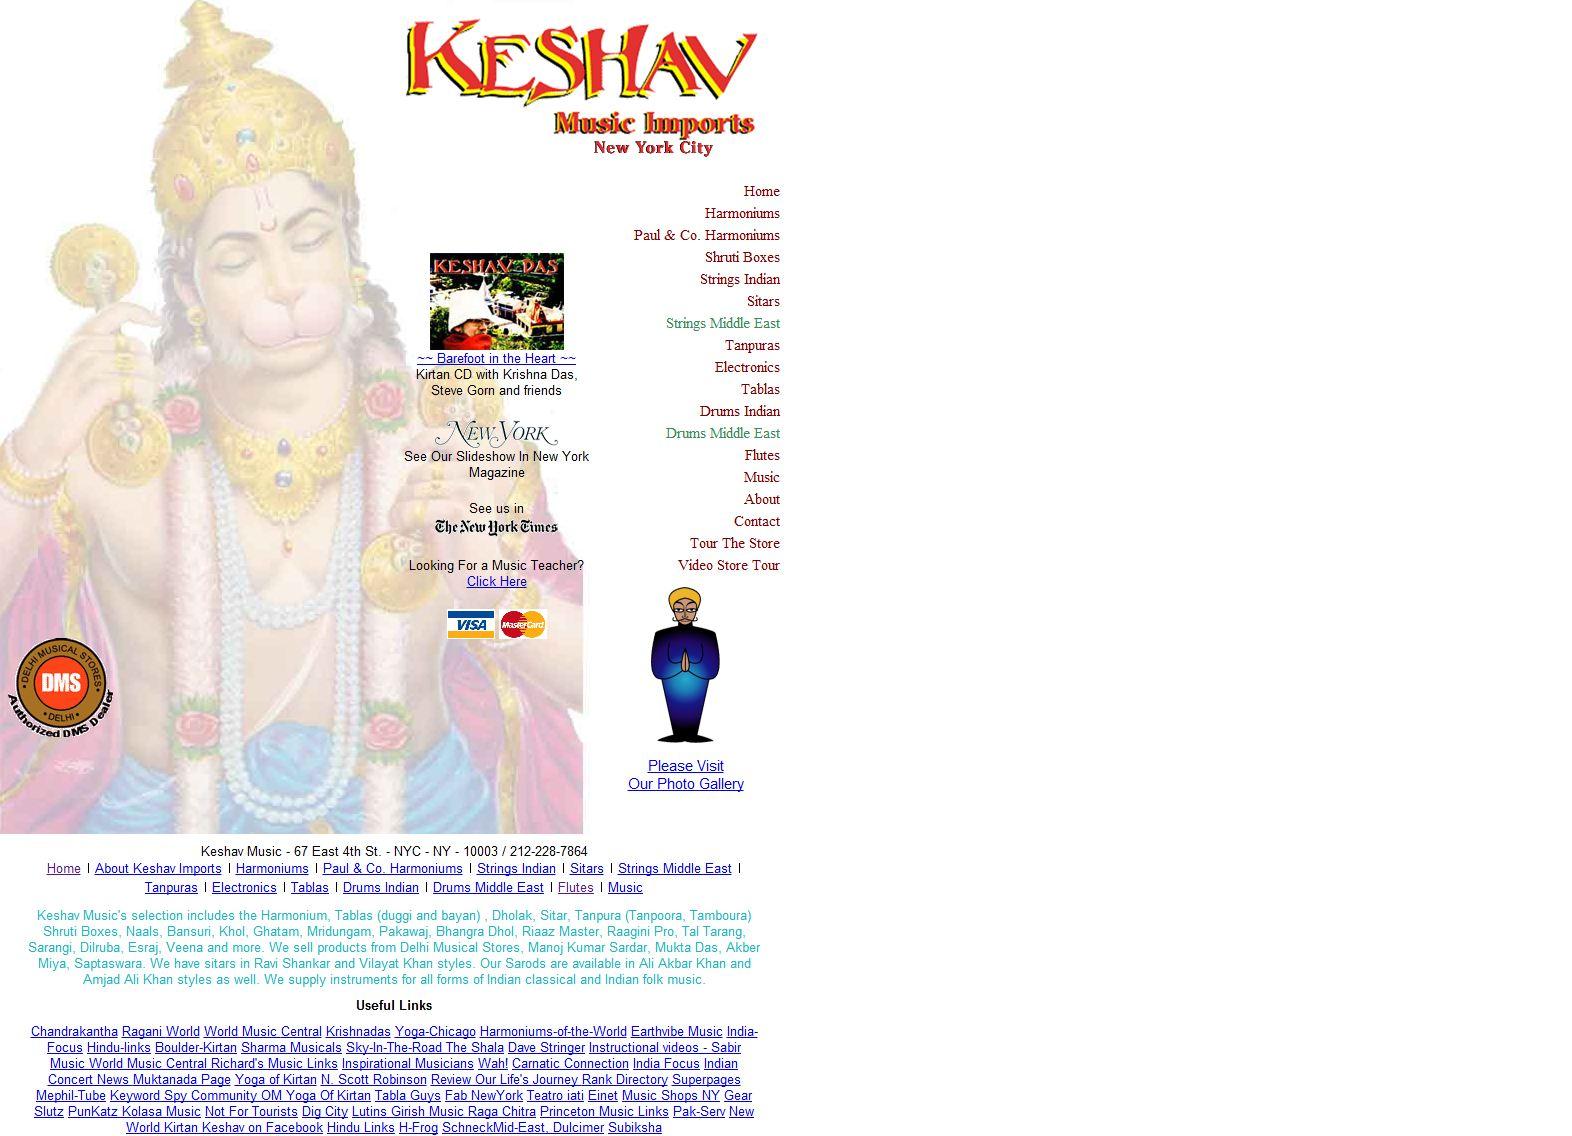 Keshav Music Im